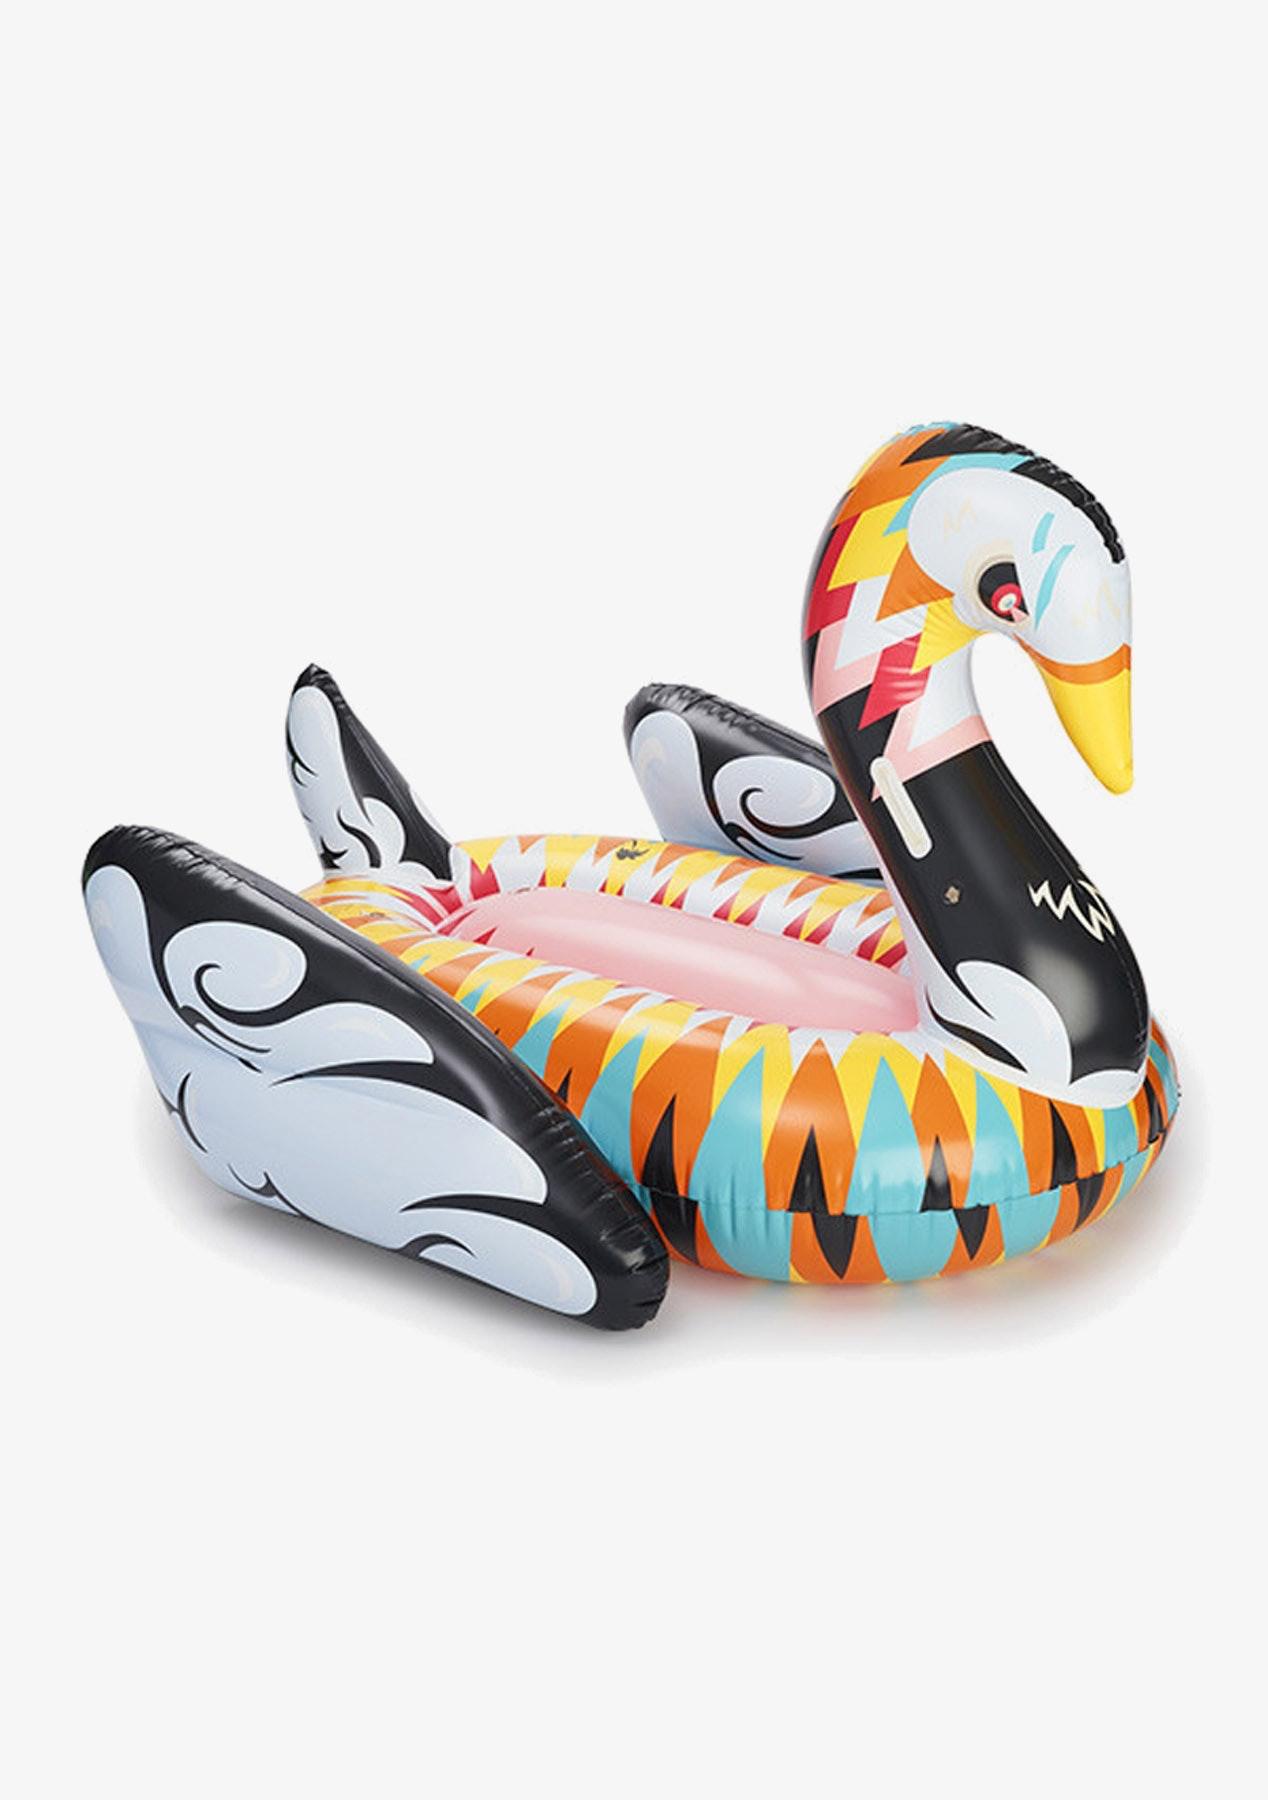 Boho Swan Inflatable - Black Multi